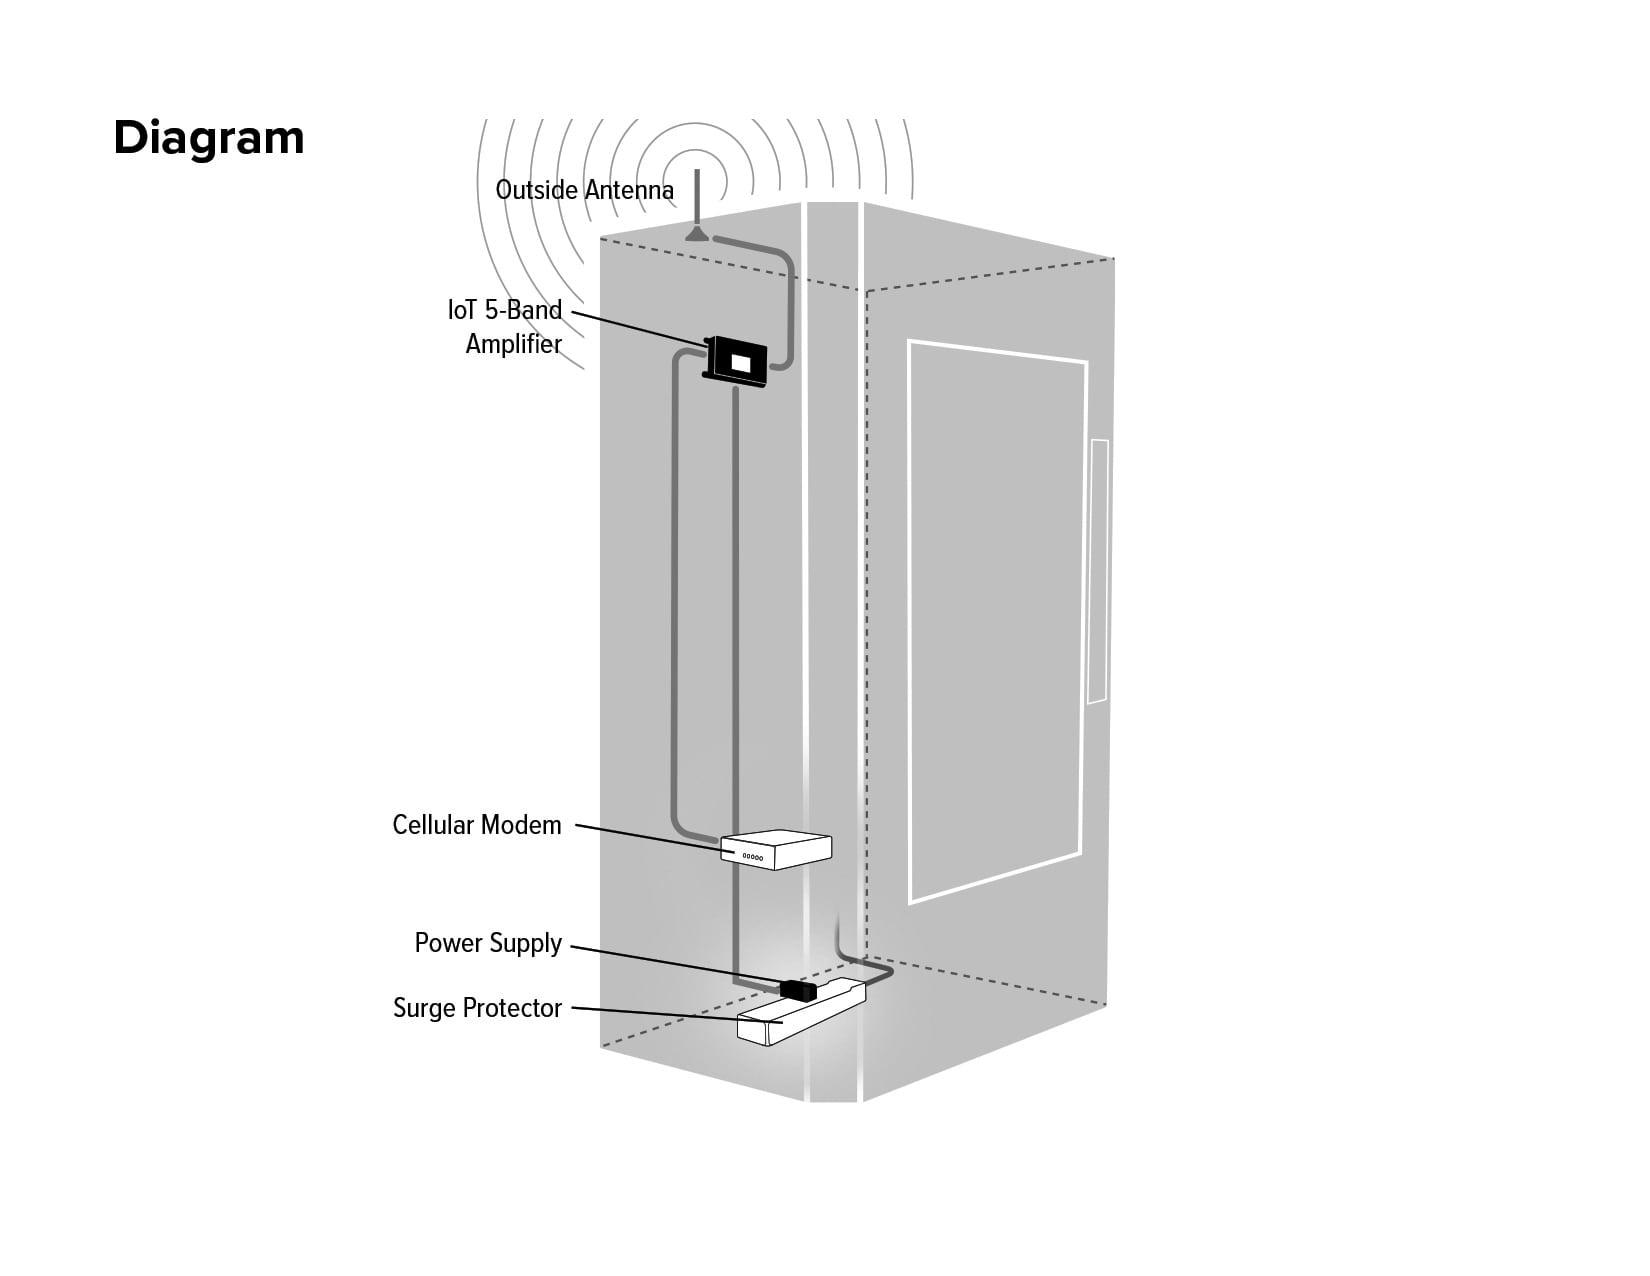 IoT_5-Band_Diagram-min